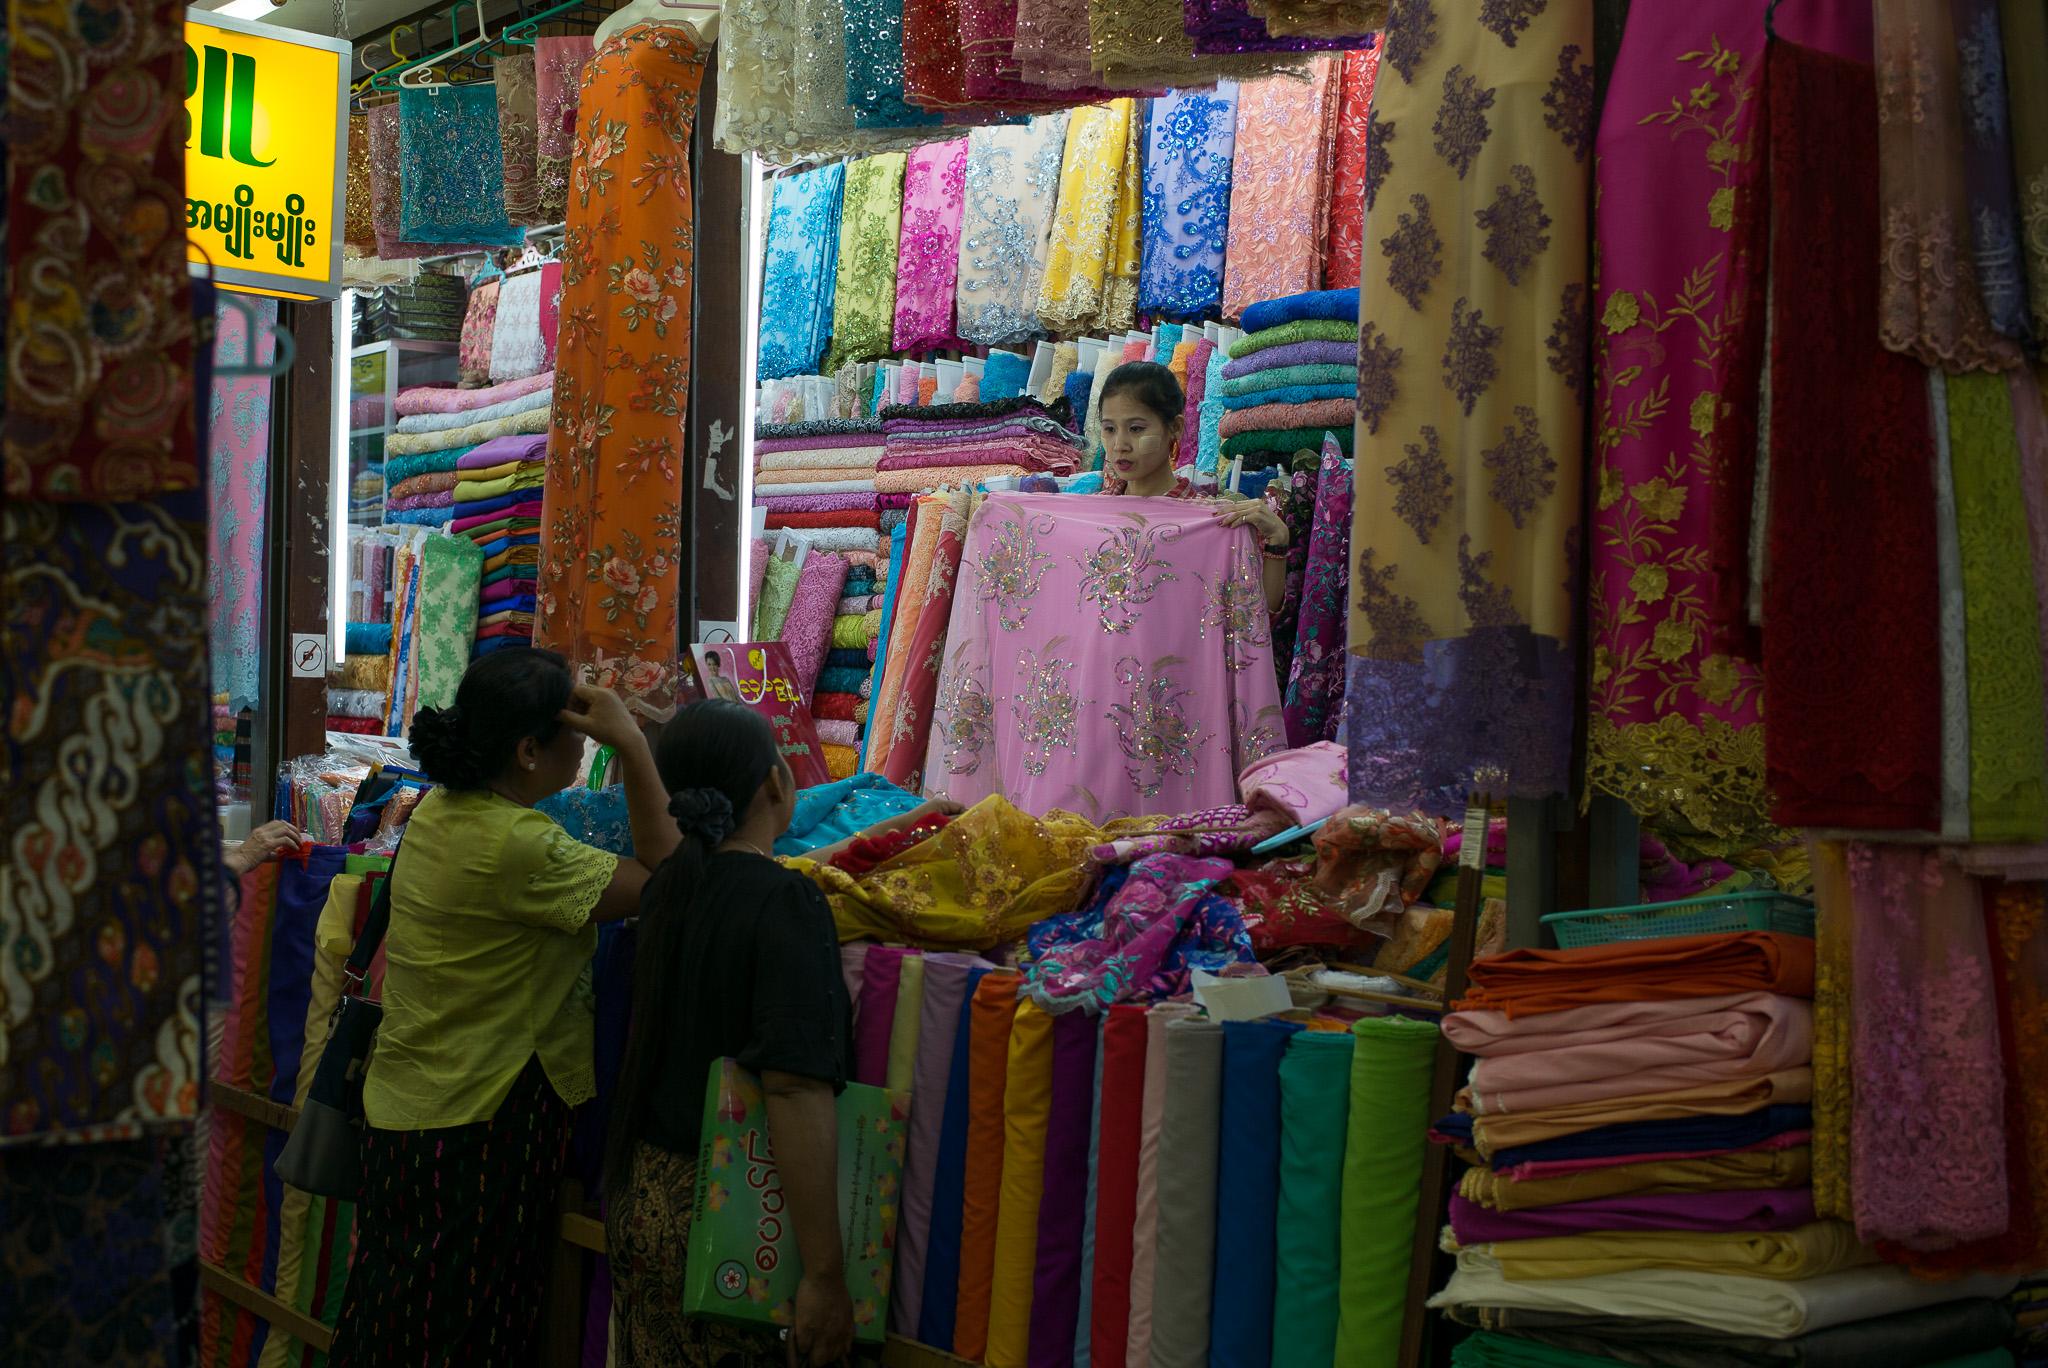 25-Burma-0346-P-1412.jpg